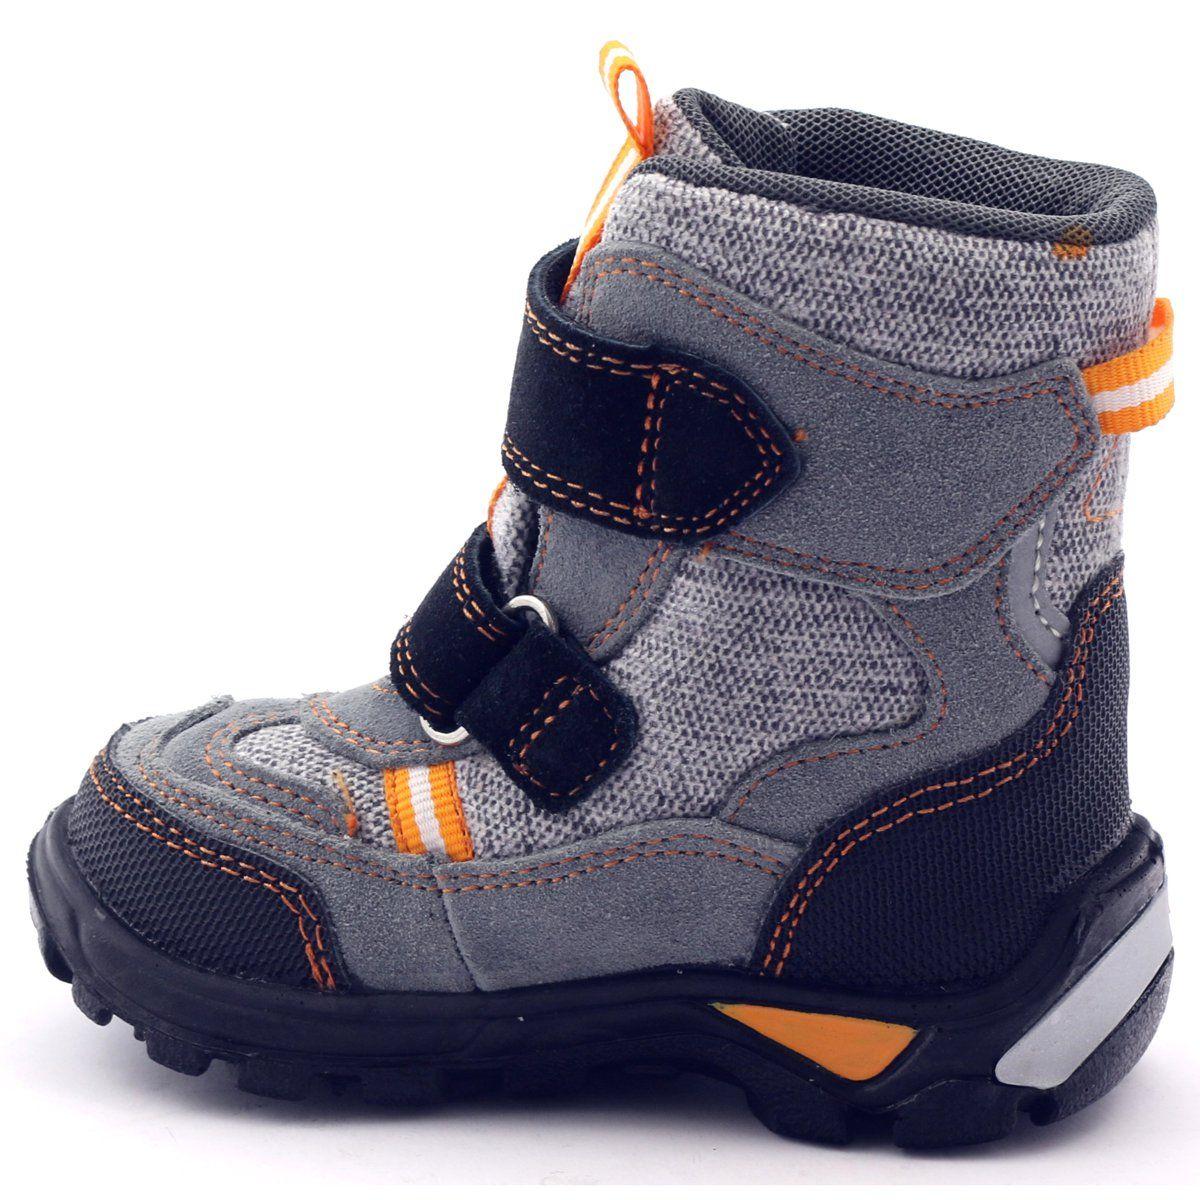 Trzewiki Z Membrana Bartek 91931 Szare Pomaranczowe Czarne Boots Hiking Boots Sneakers Nike